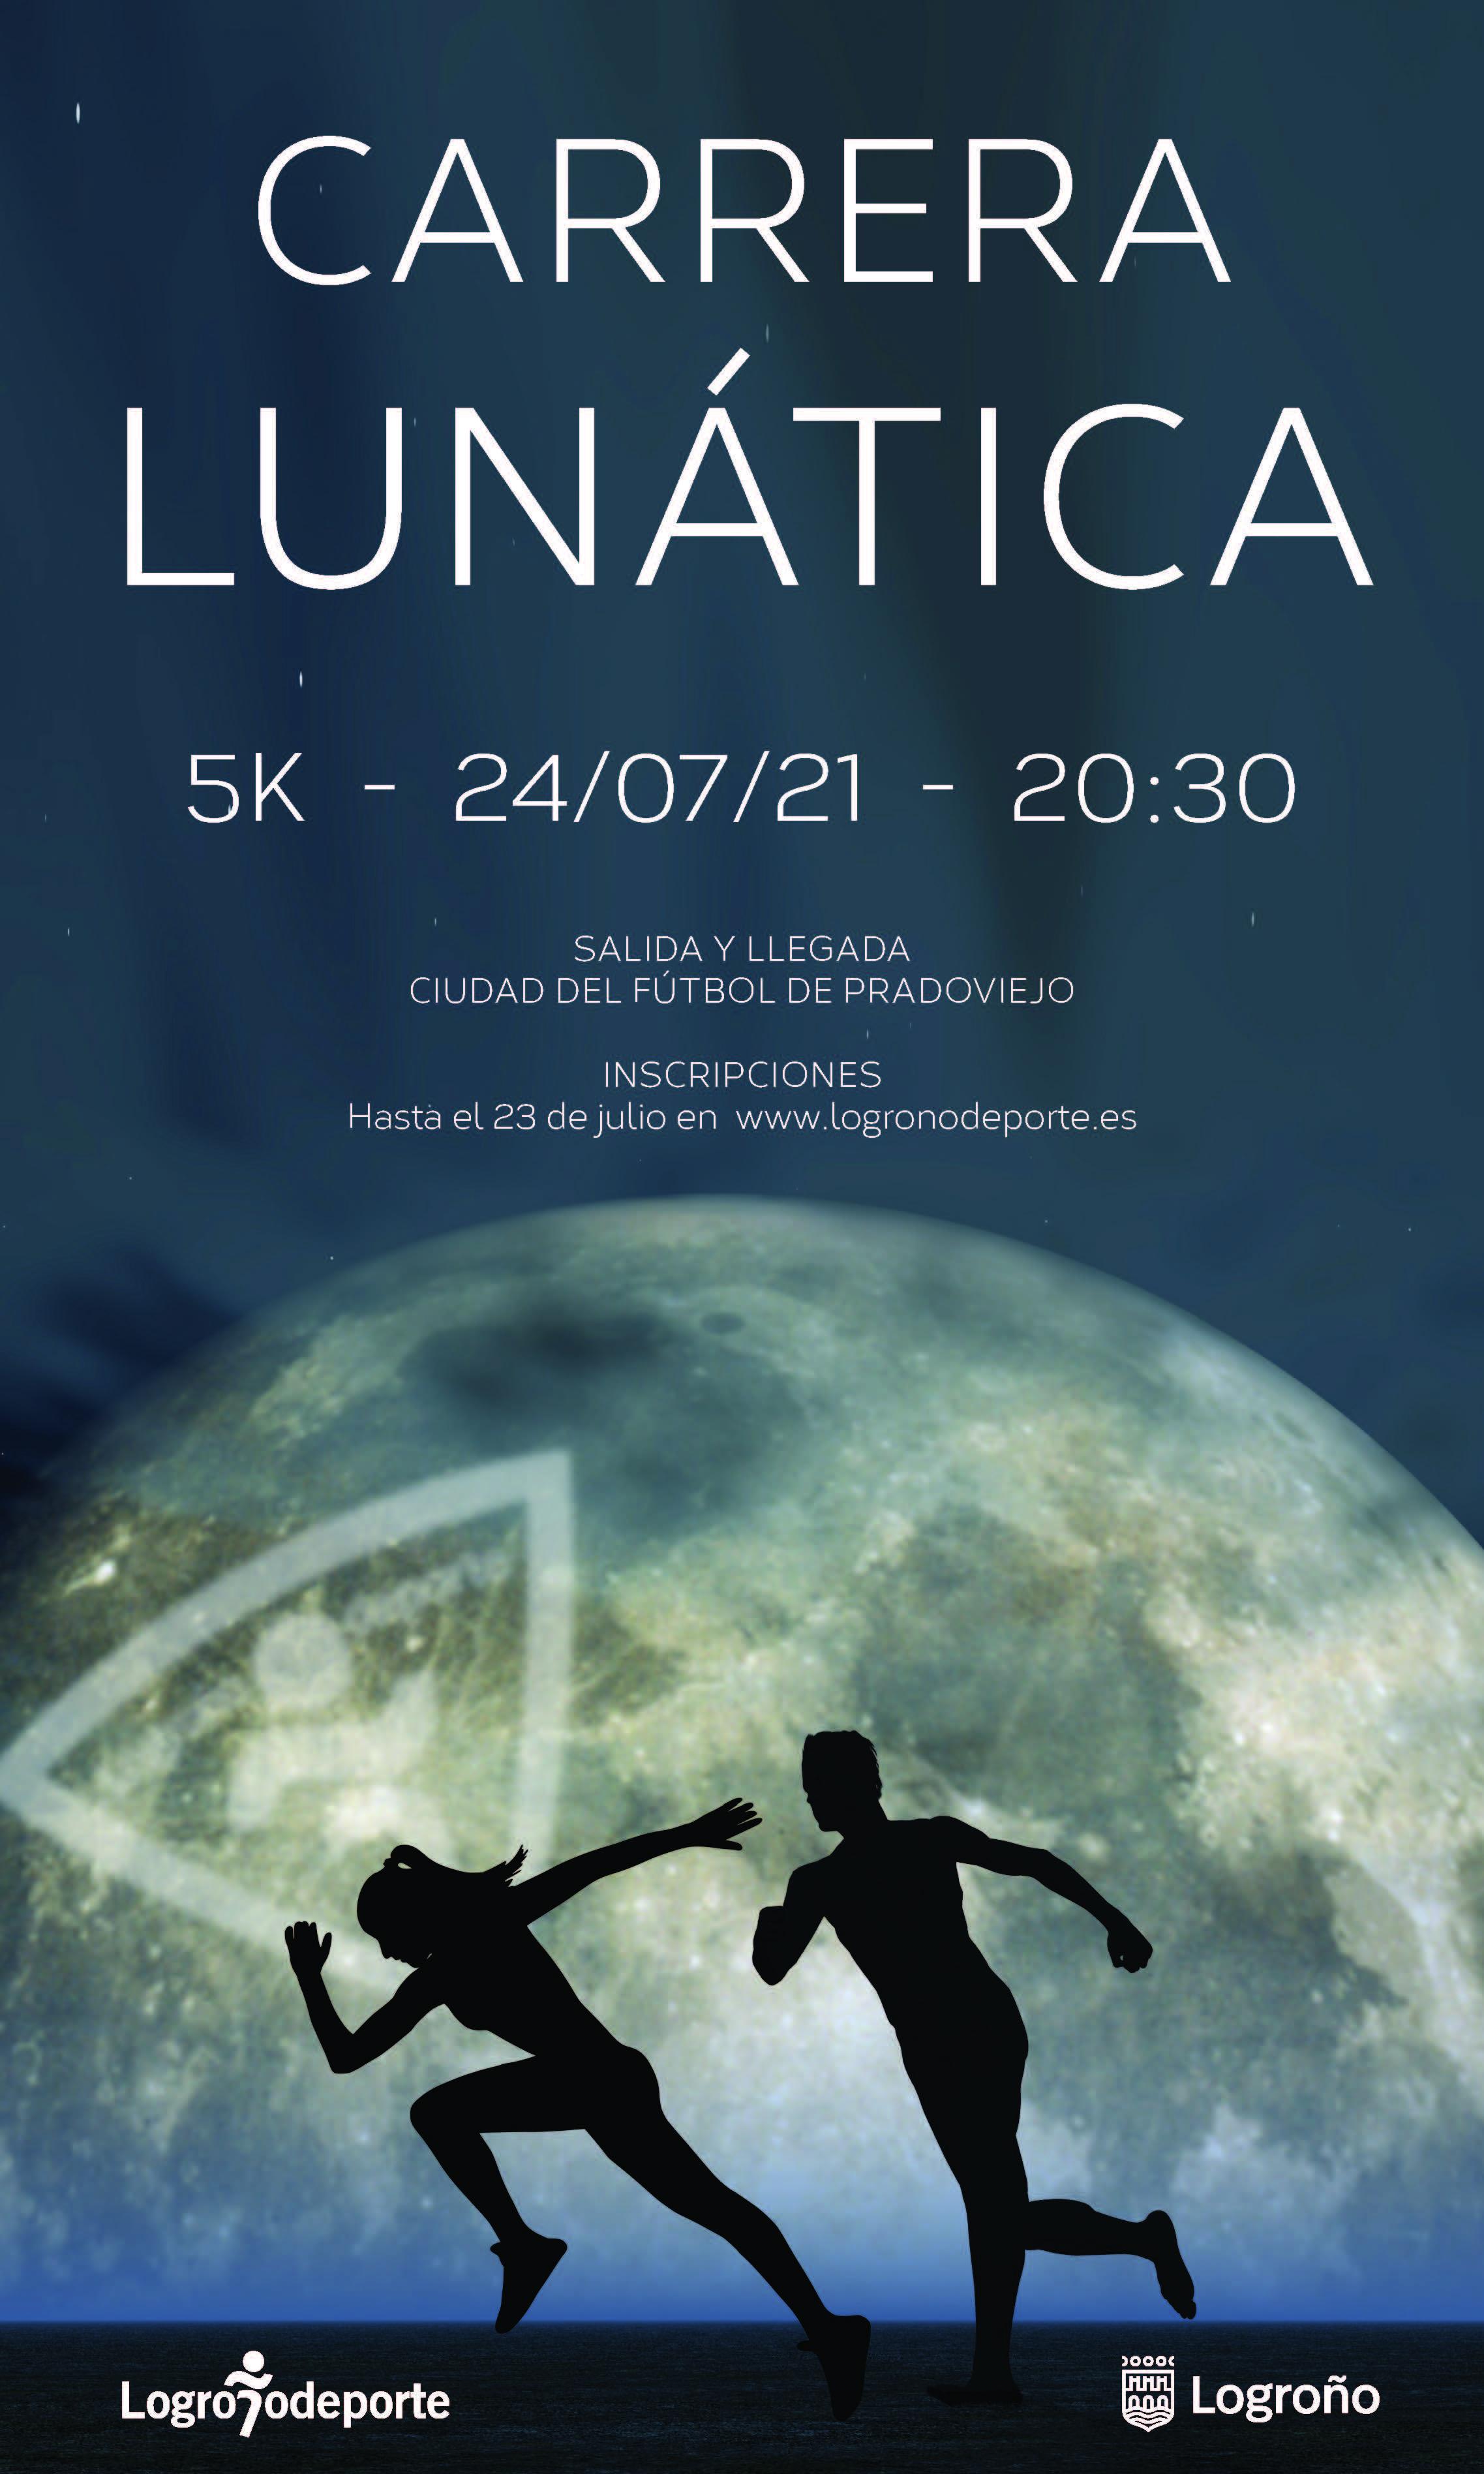 Carrera Lunática 2021